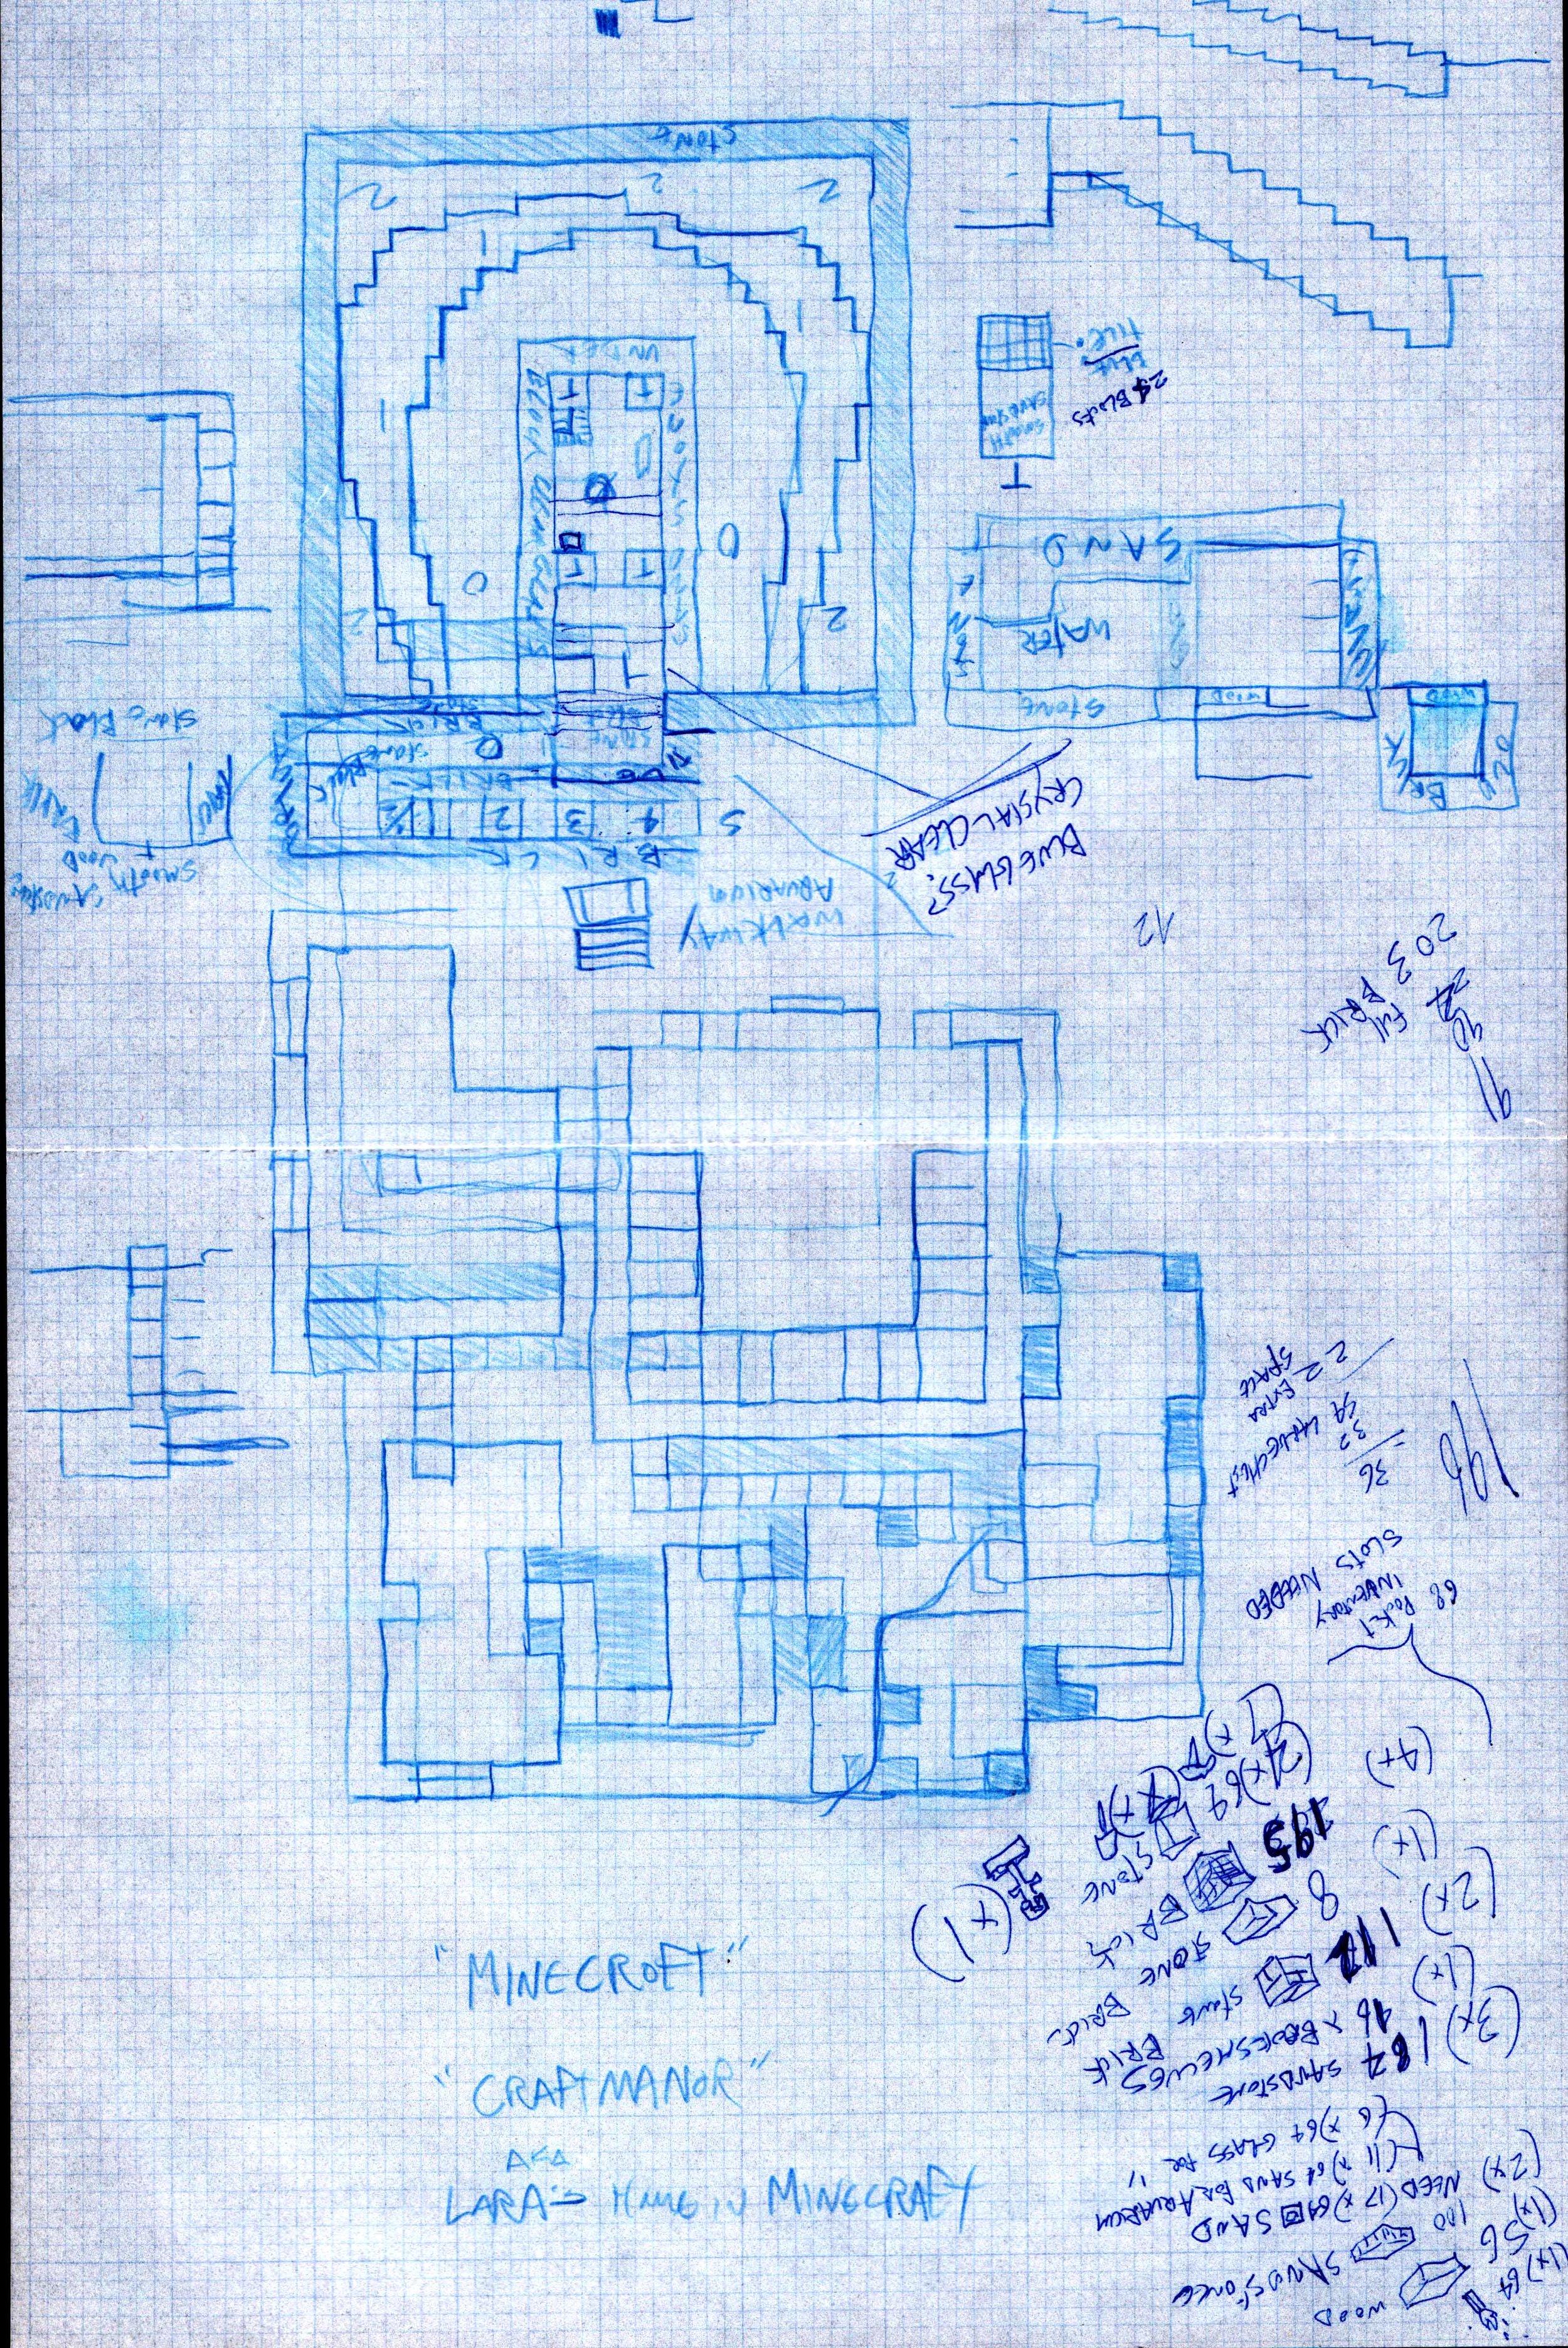 MinecraftManor 1.0 Floorplans.jpg